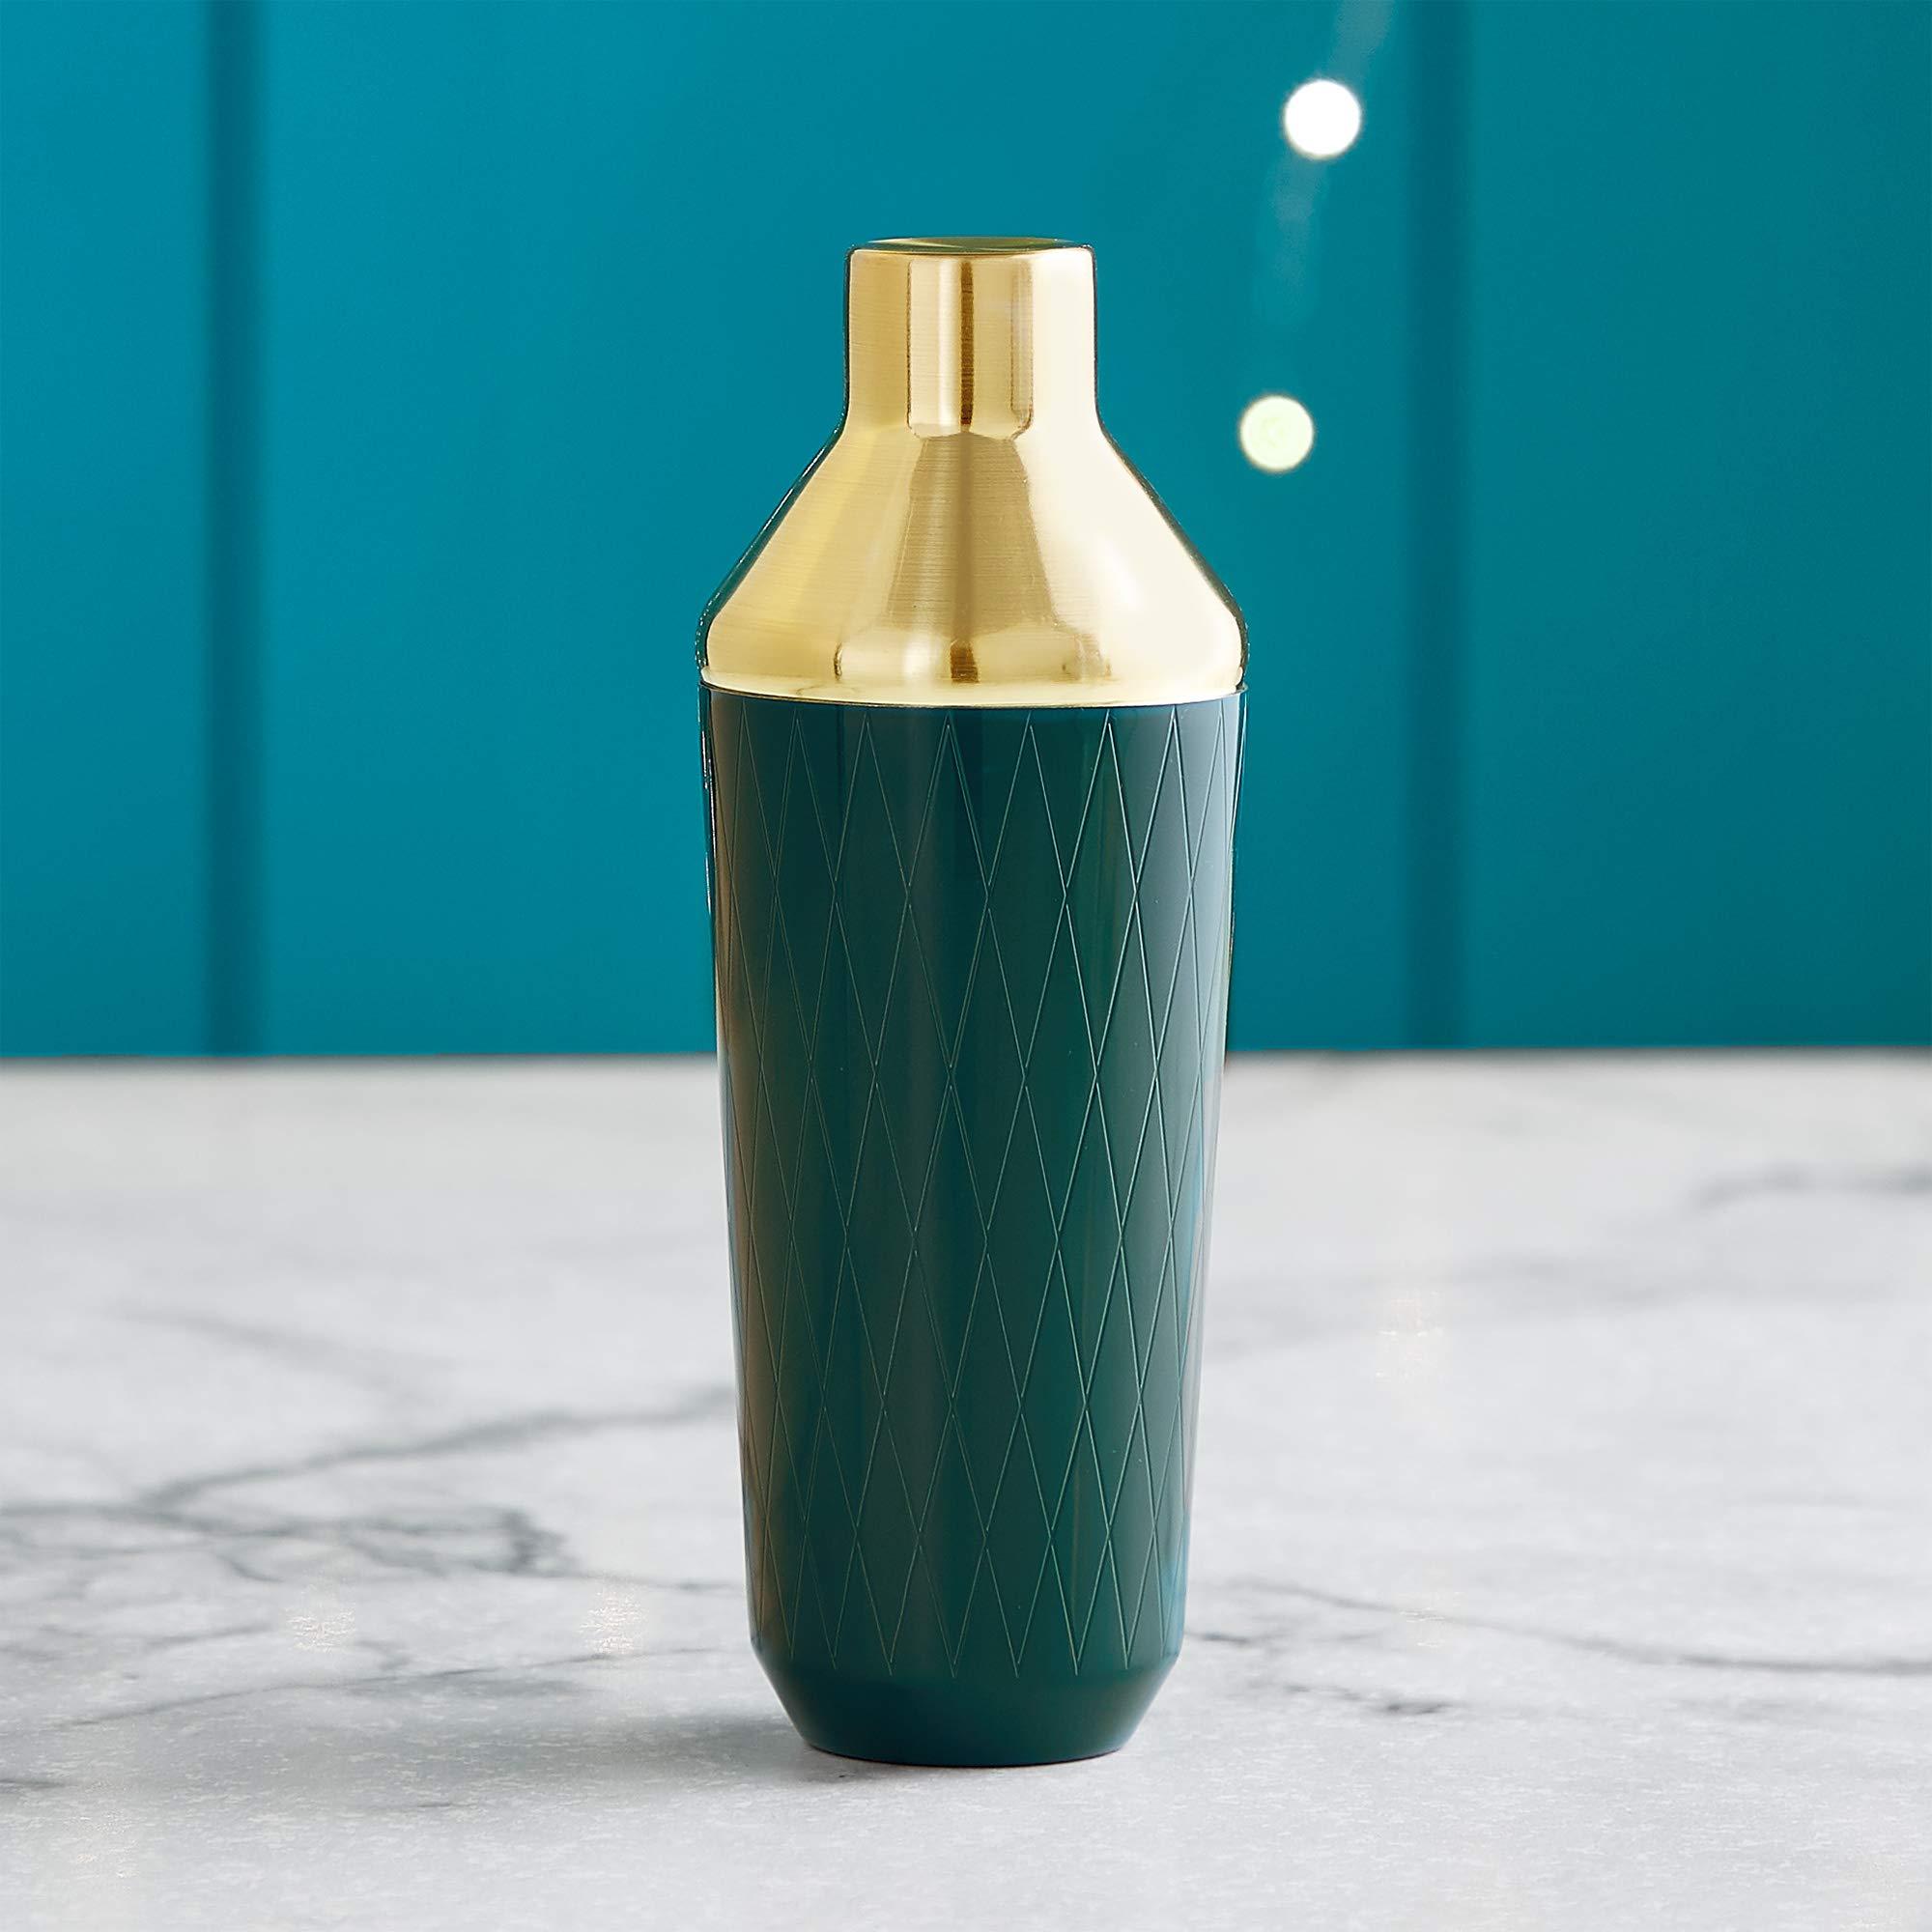 VonShef Green & Gold Cocktail Shaker Set in Gift Box with 16oz Shaker, Muddler, Bar Spoon, Jigger, Hawthorne Strainer, Julep Strainer, Bottle Pourer and Recipe Book by VonShef (Image #7)